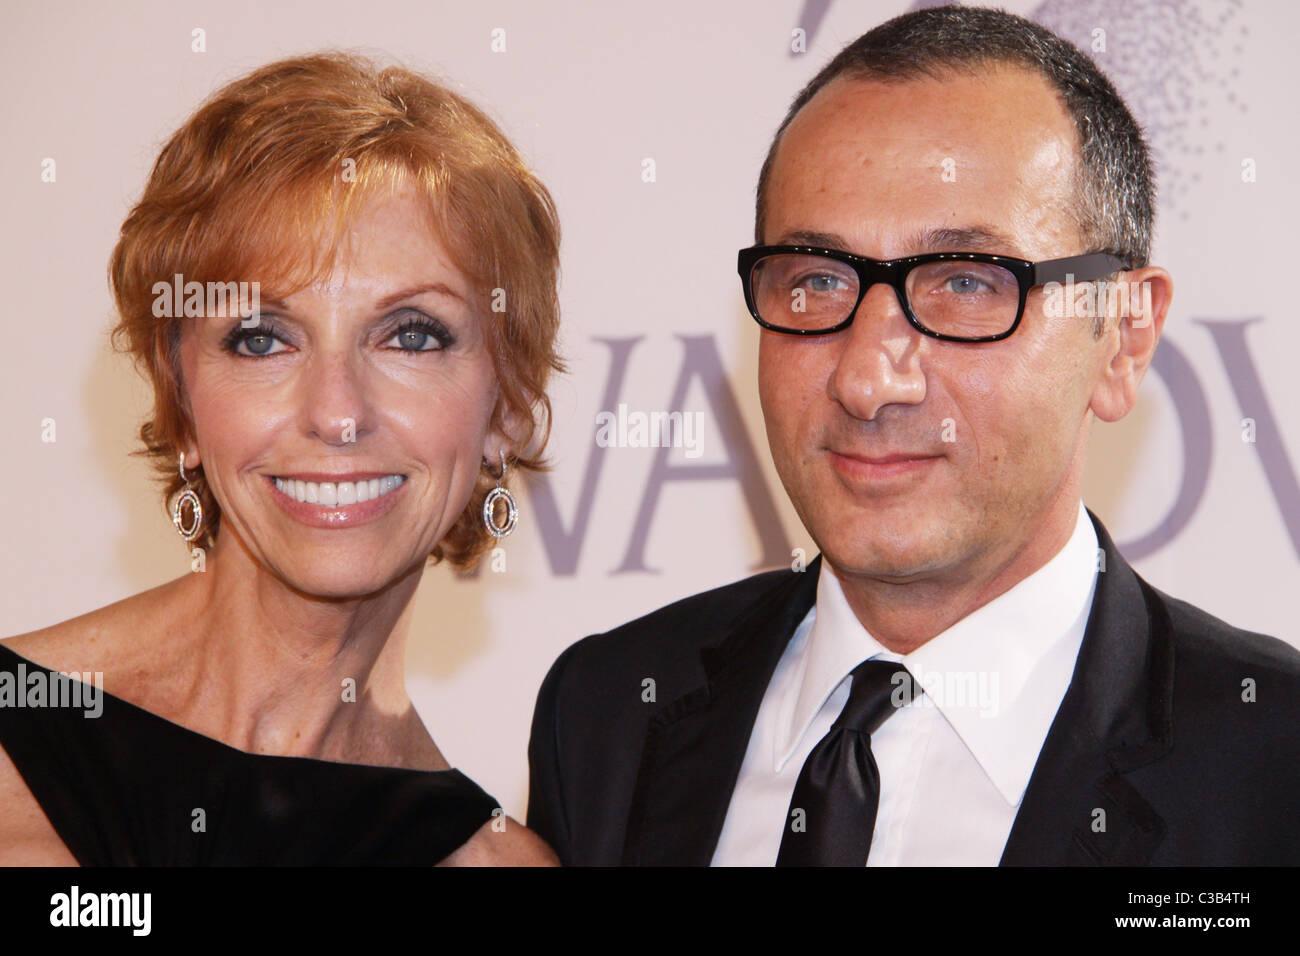 Susan Sokol and Gilles Mendel 2009 CFDA Fashion Awards at Alice Tully Hall, Lincoln Center New York City, USA - - Stock Image